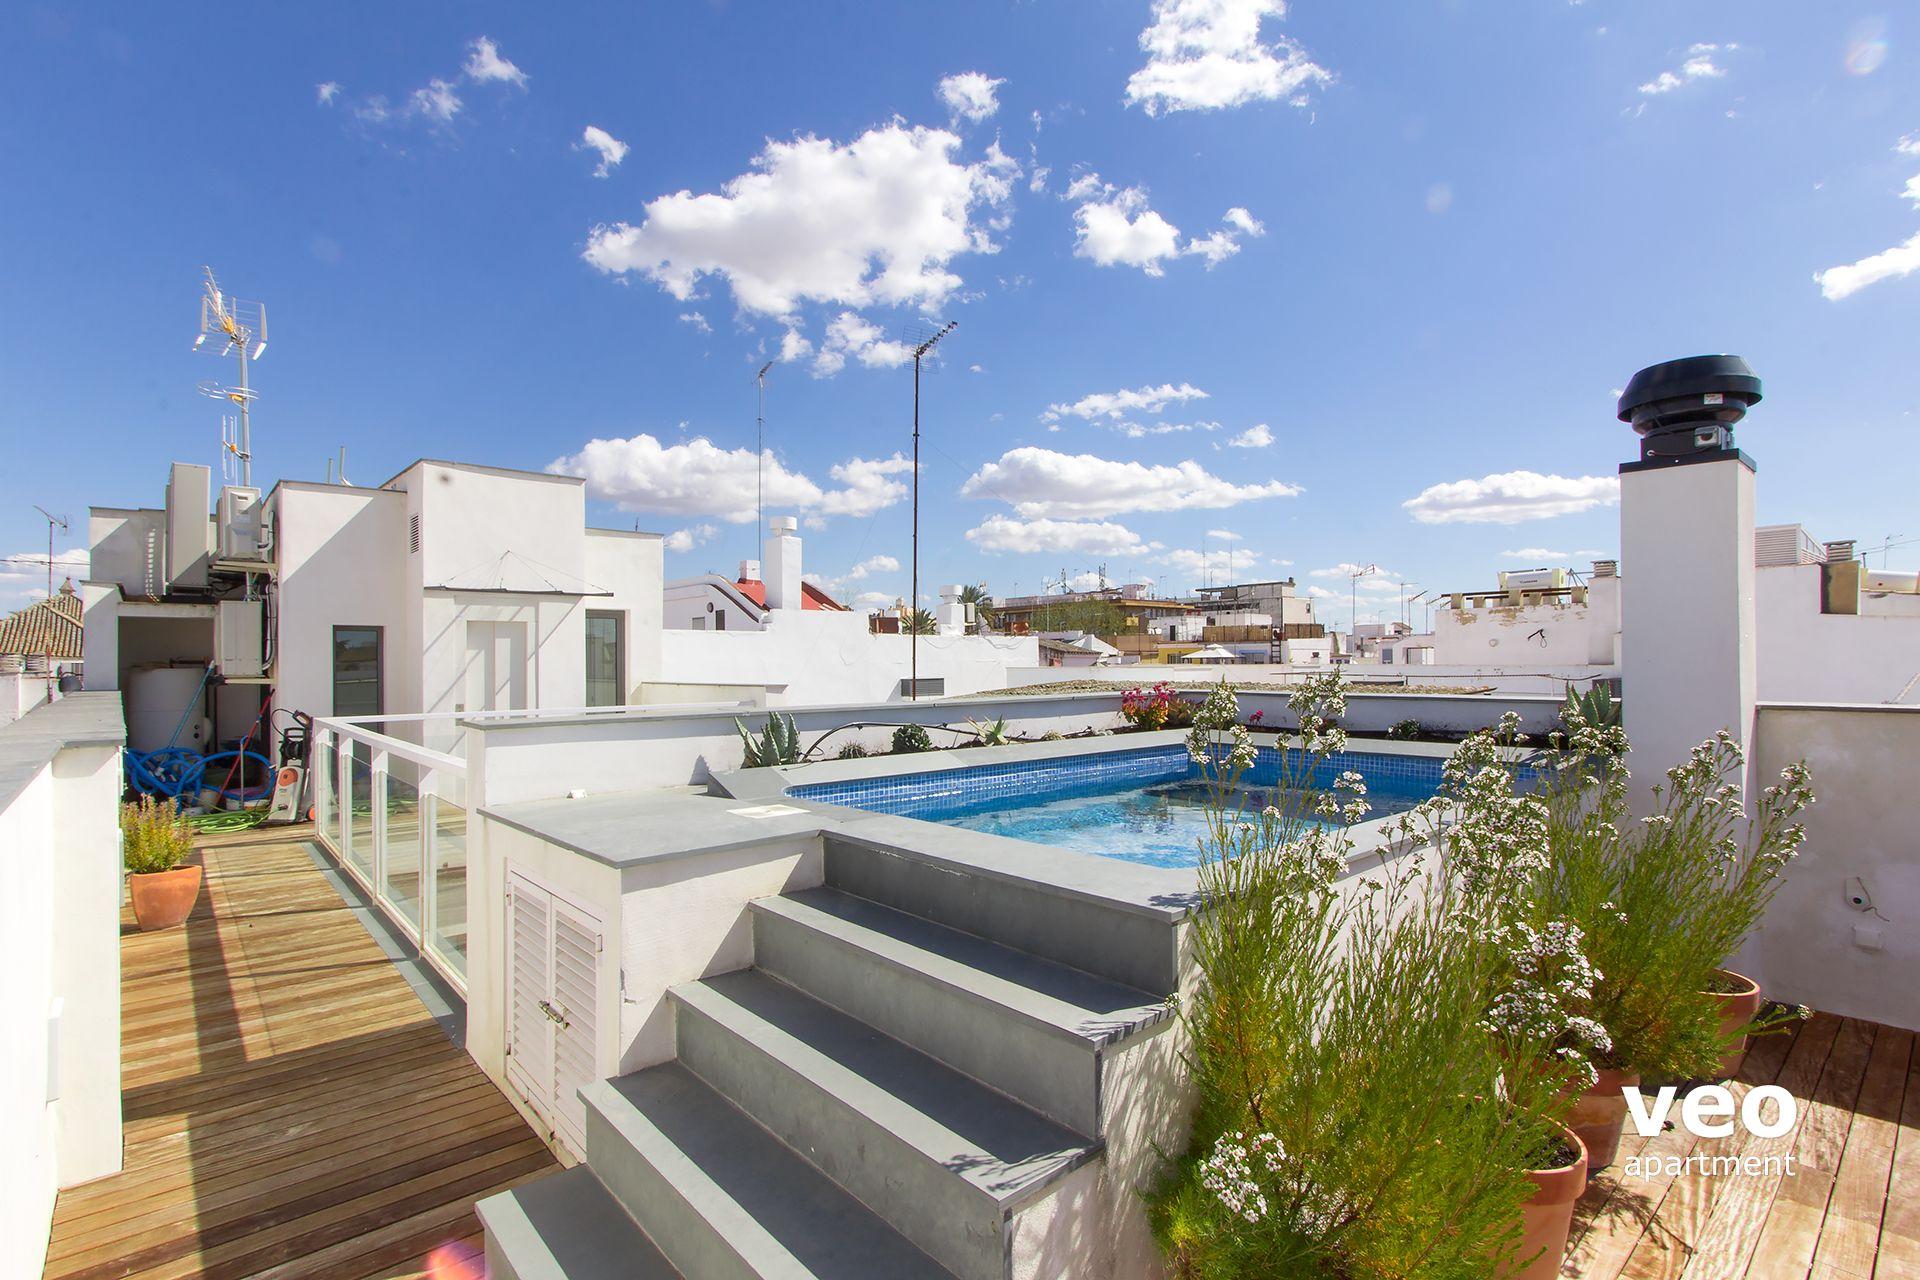 Teodosio Terrace pour Hotel Seville Piscine